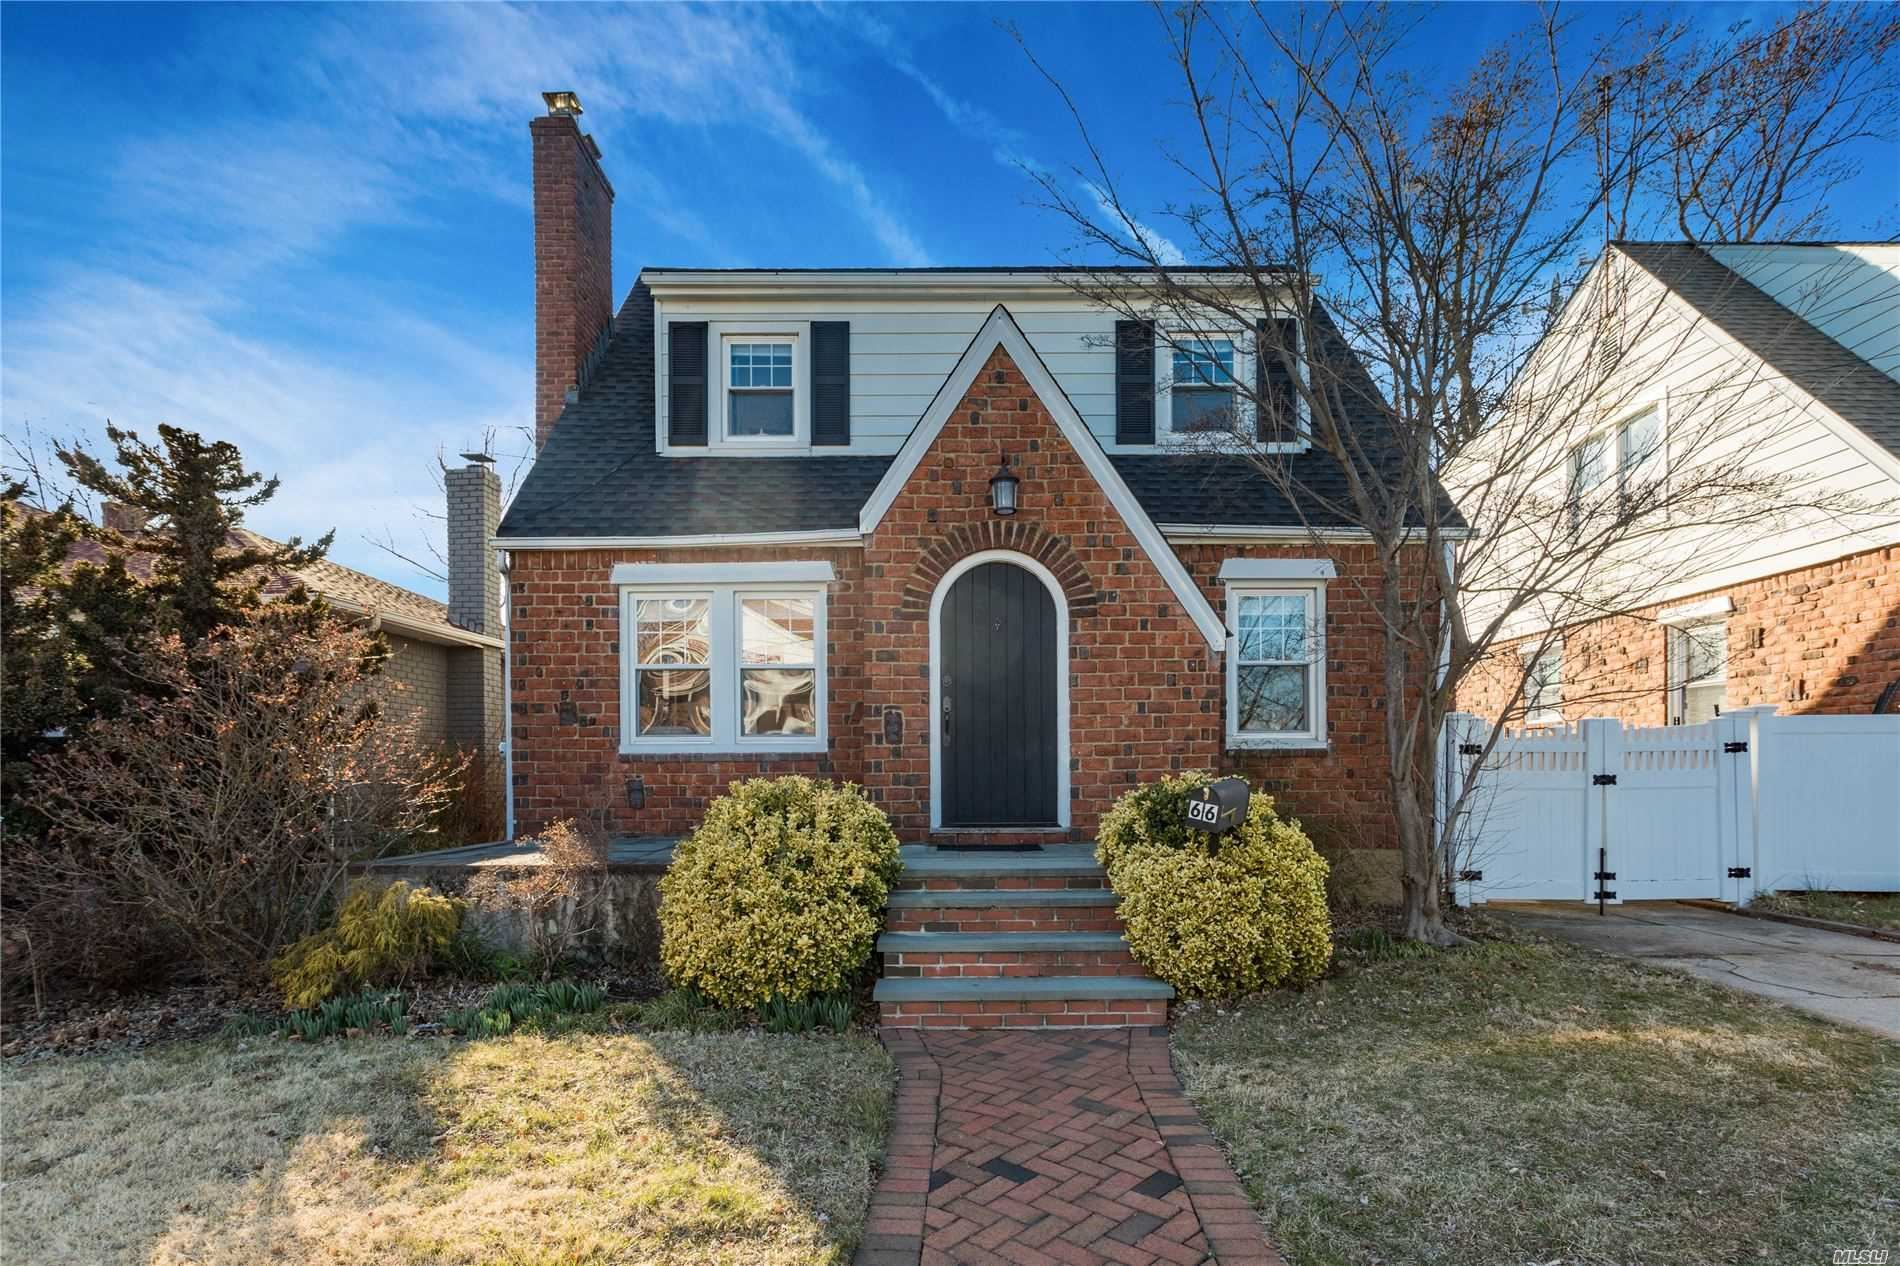 66 Morton Avenue, West Hempstead, NY 11552 - MLS#: 3204819